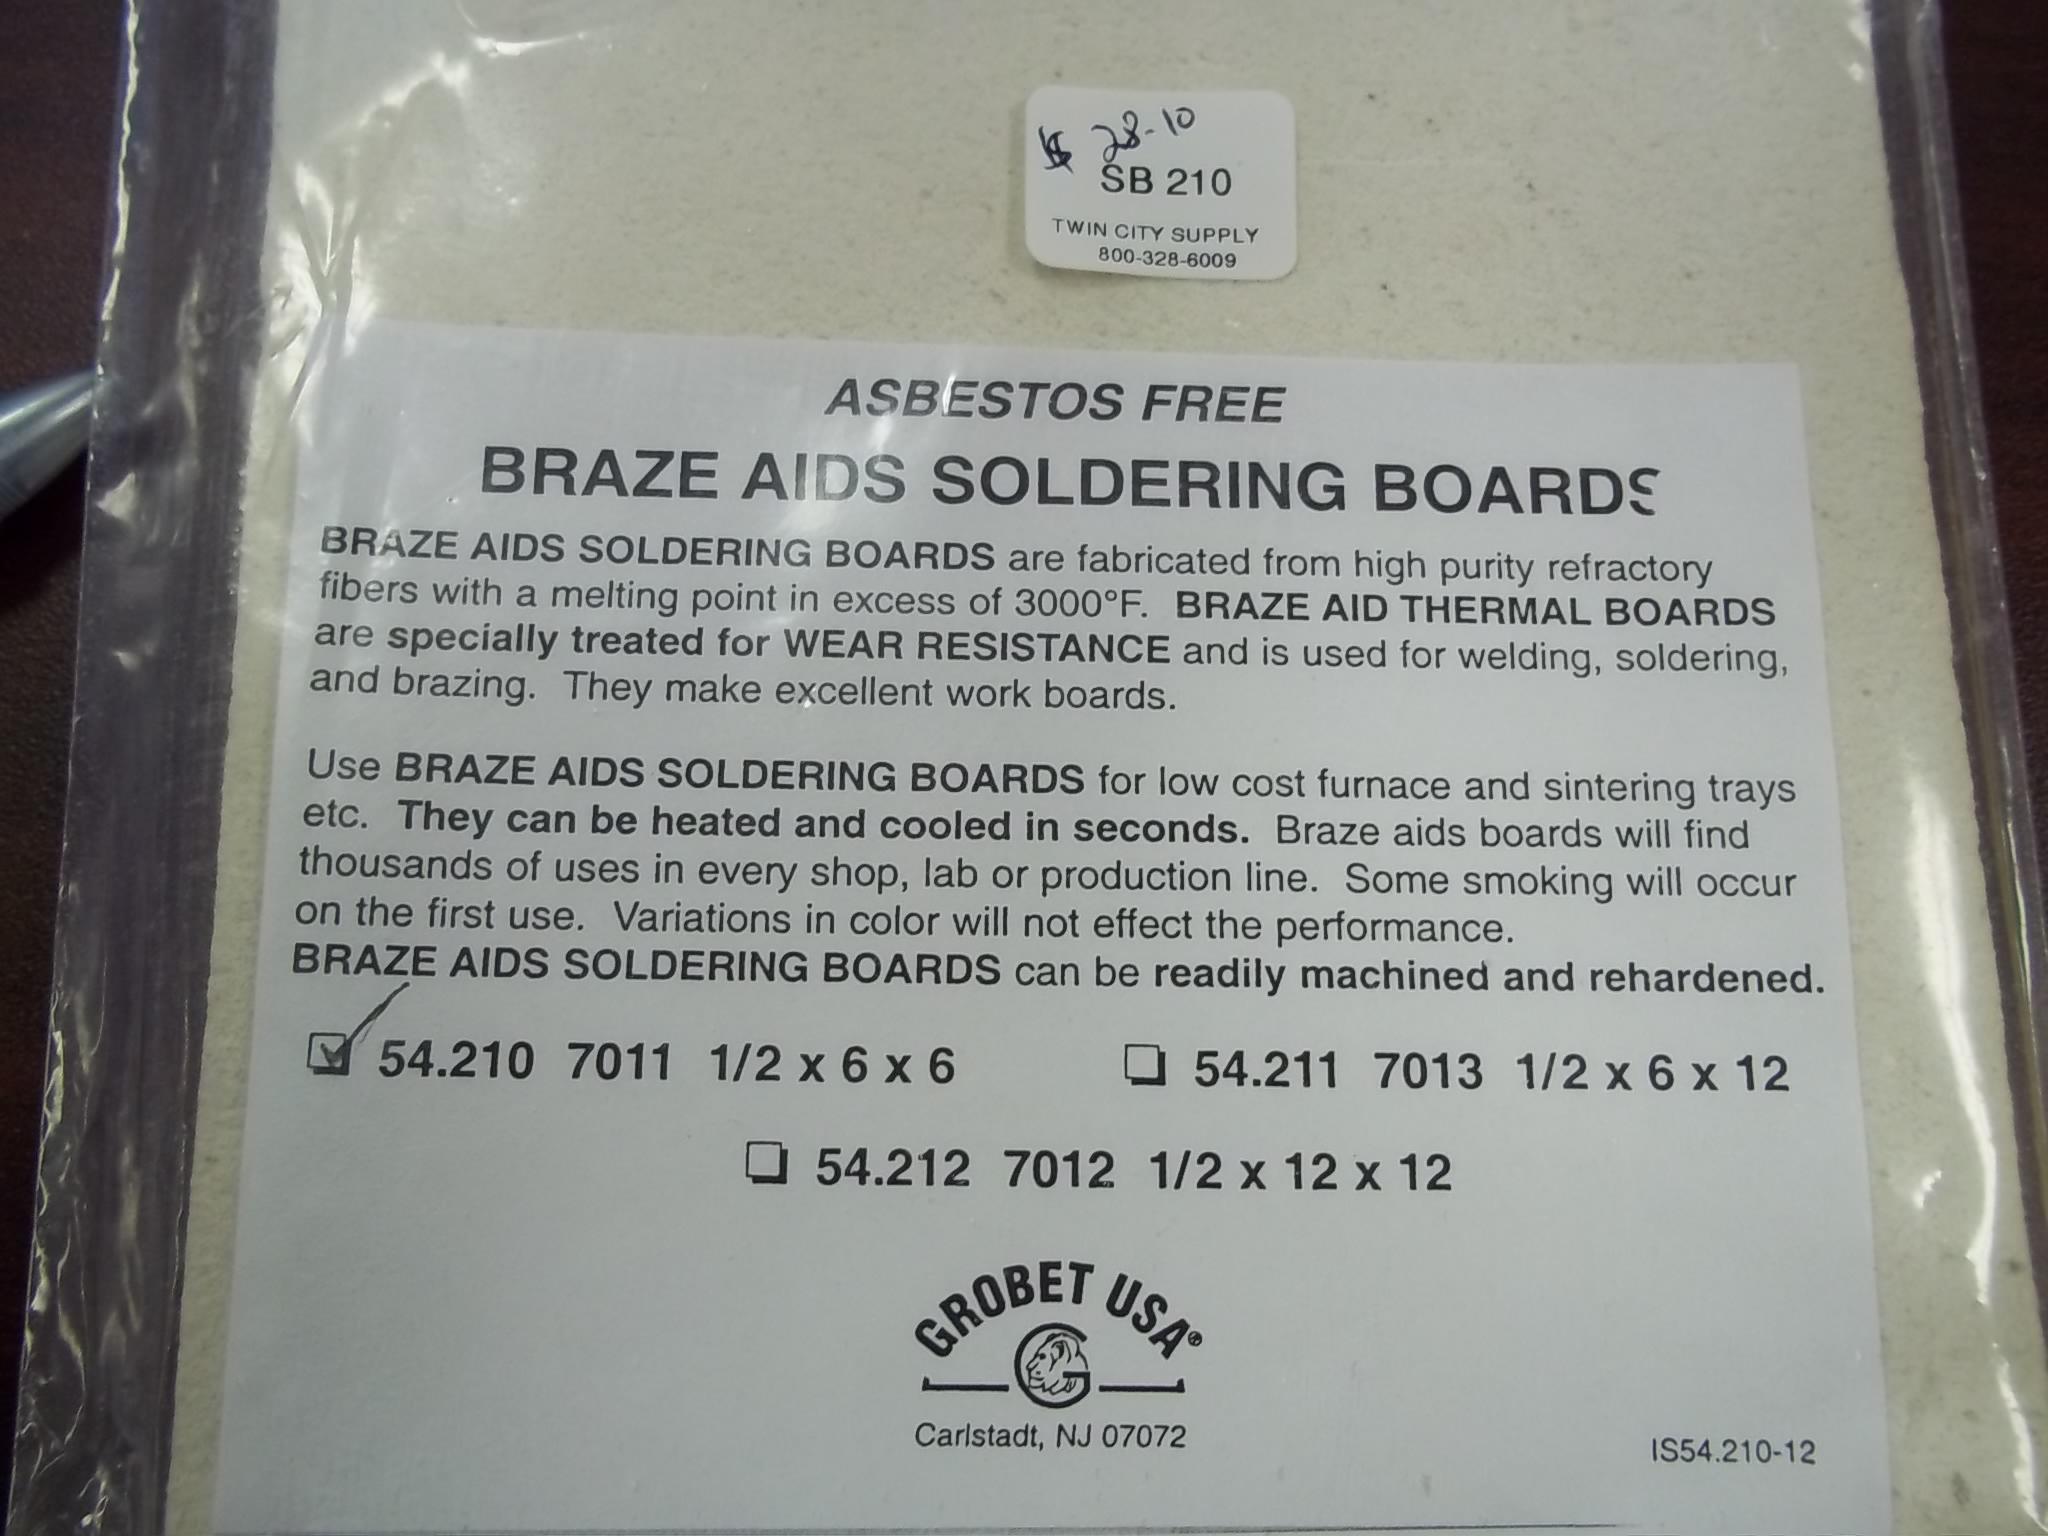 SB210 Asbestos Free Braze Aids Soldering Boards-also great for platinum! Grobet